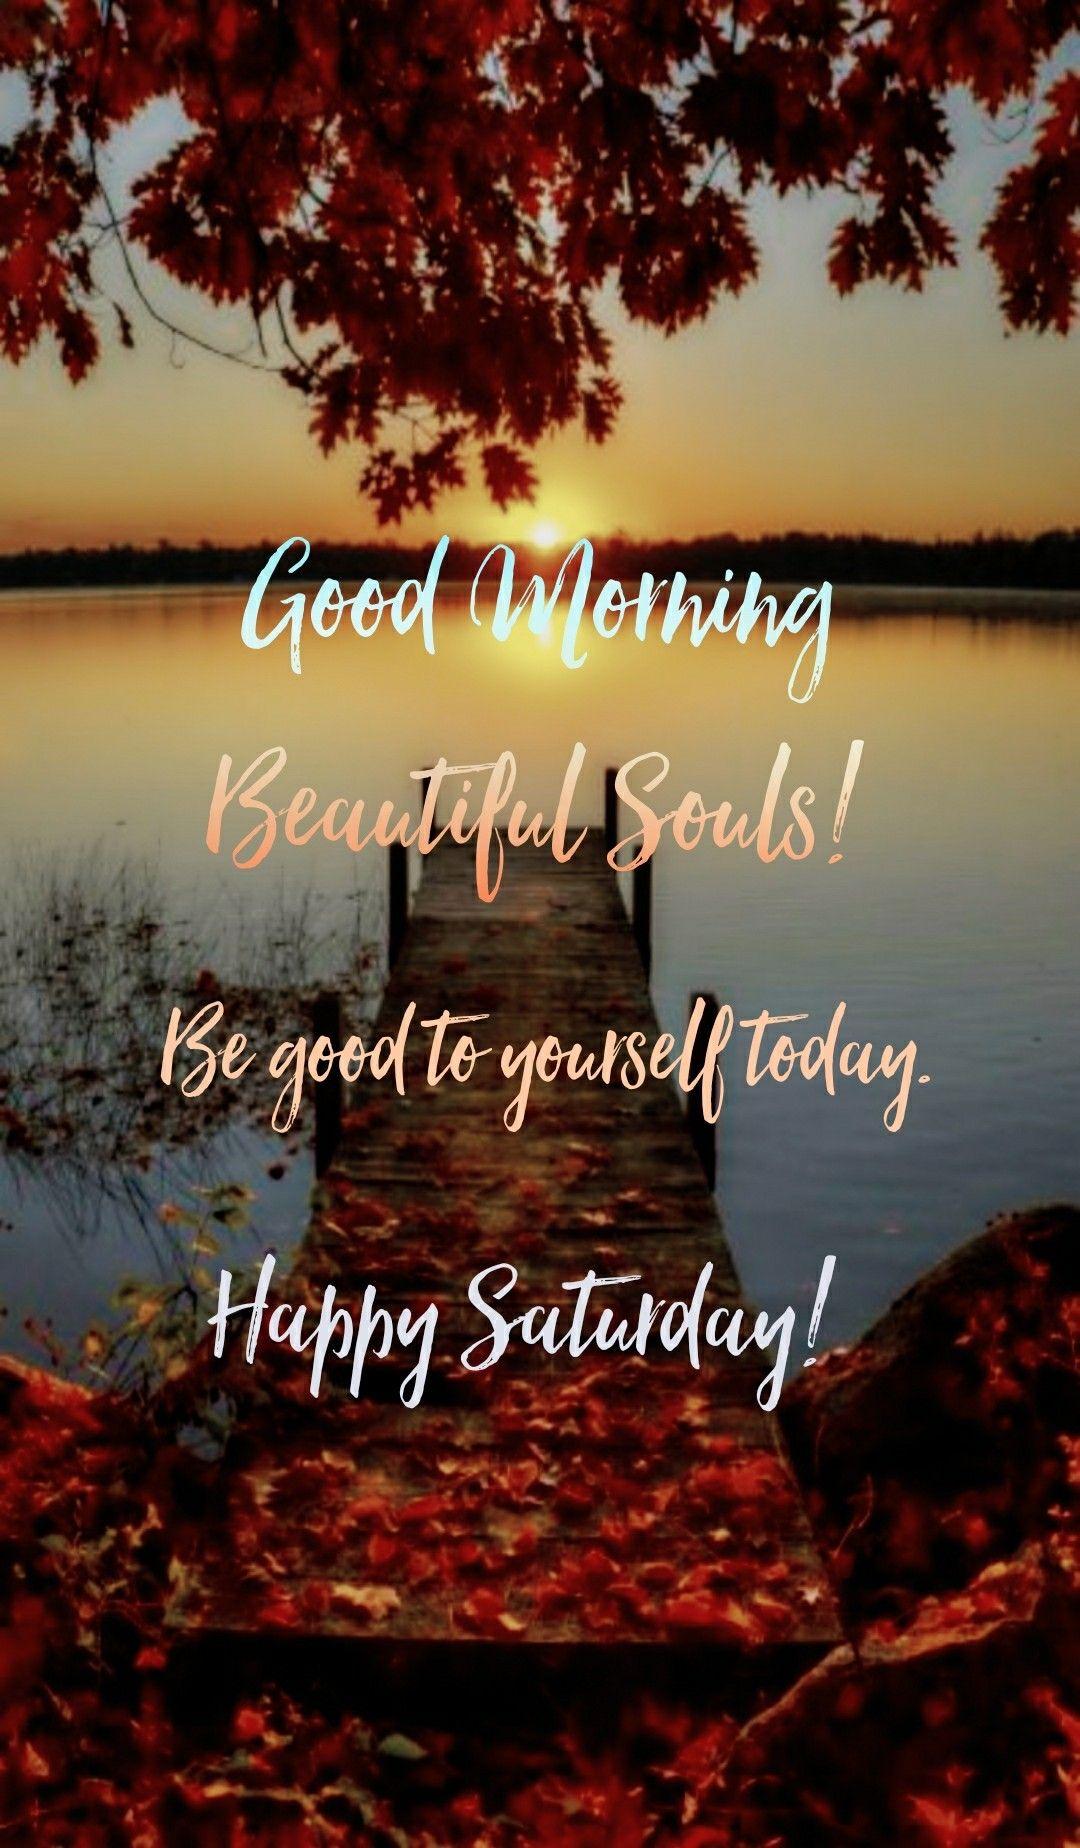 Good Morning Happy Saturday Goodmorning Mormingmeme Morning Gm Gmw Happysaturday Satu Happy Weekend Quotes Happy Saturday Quotes Happy Saturday Images